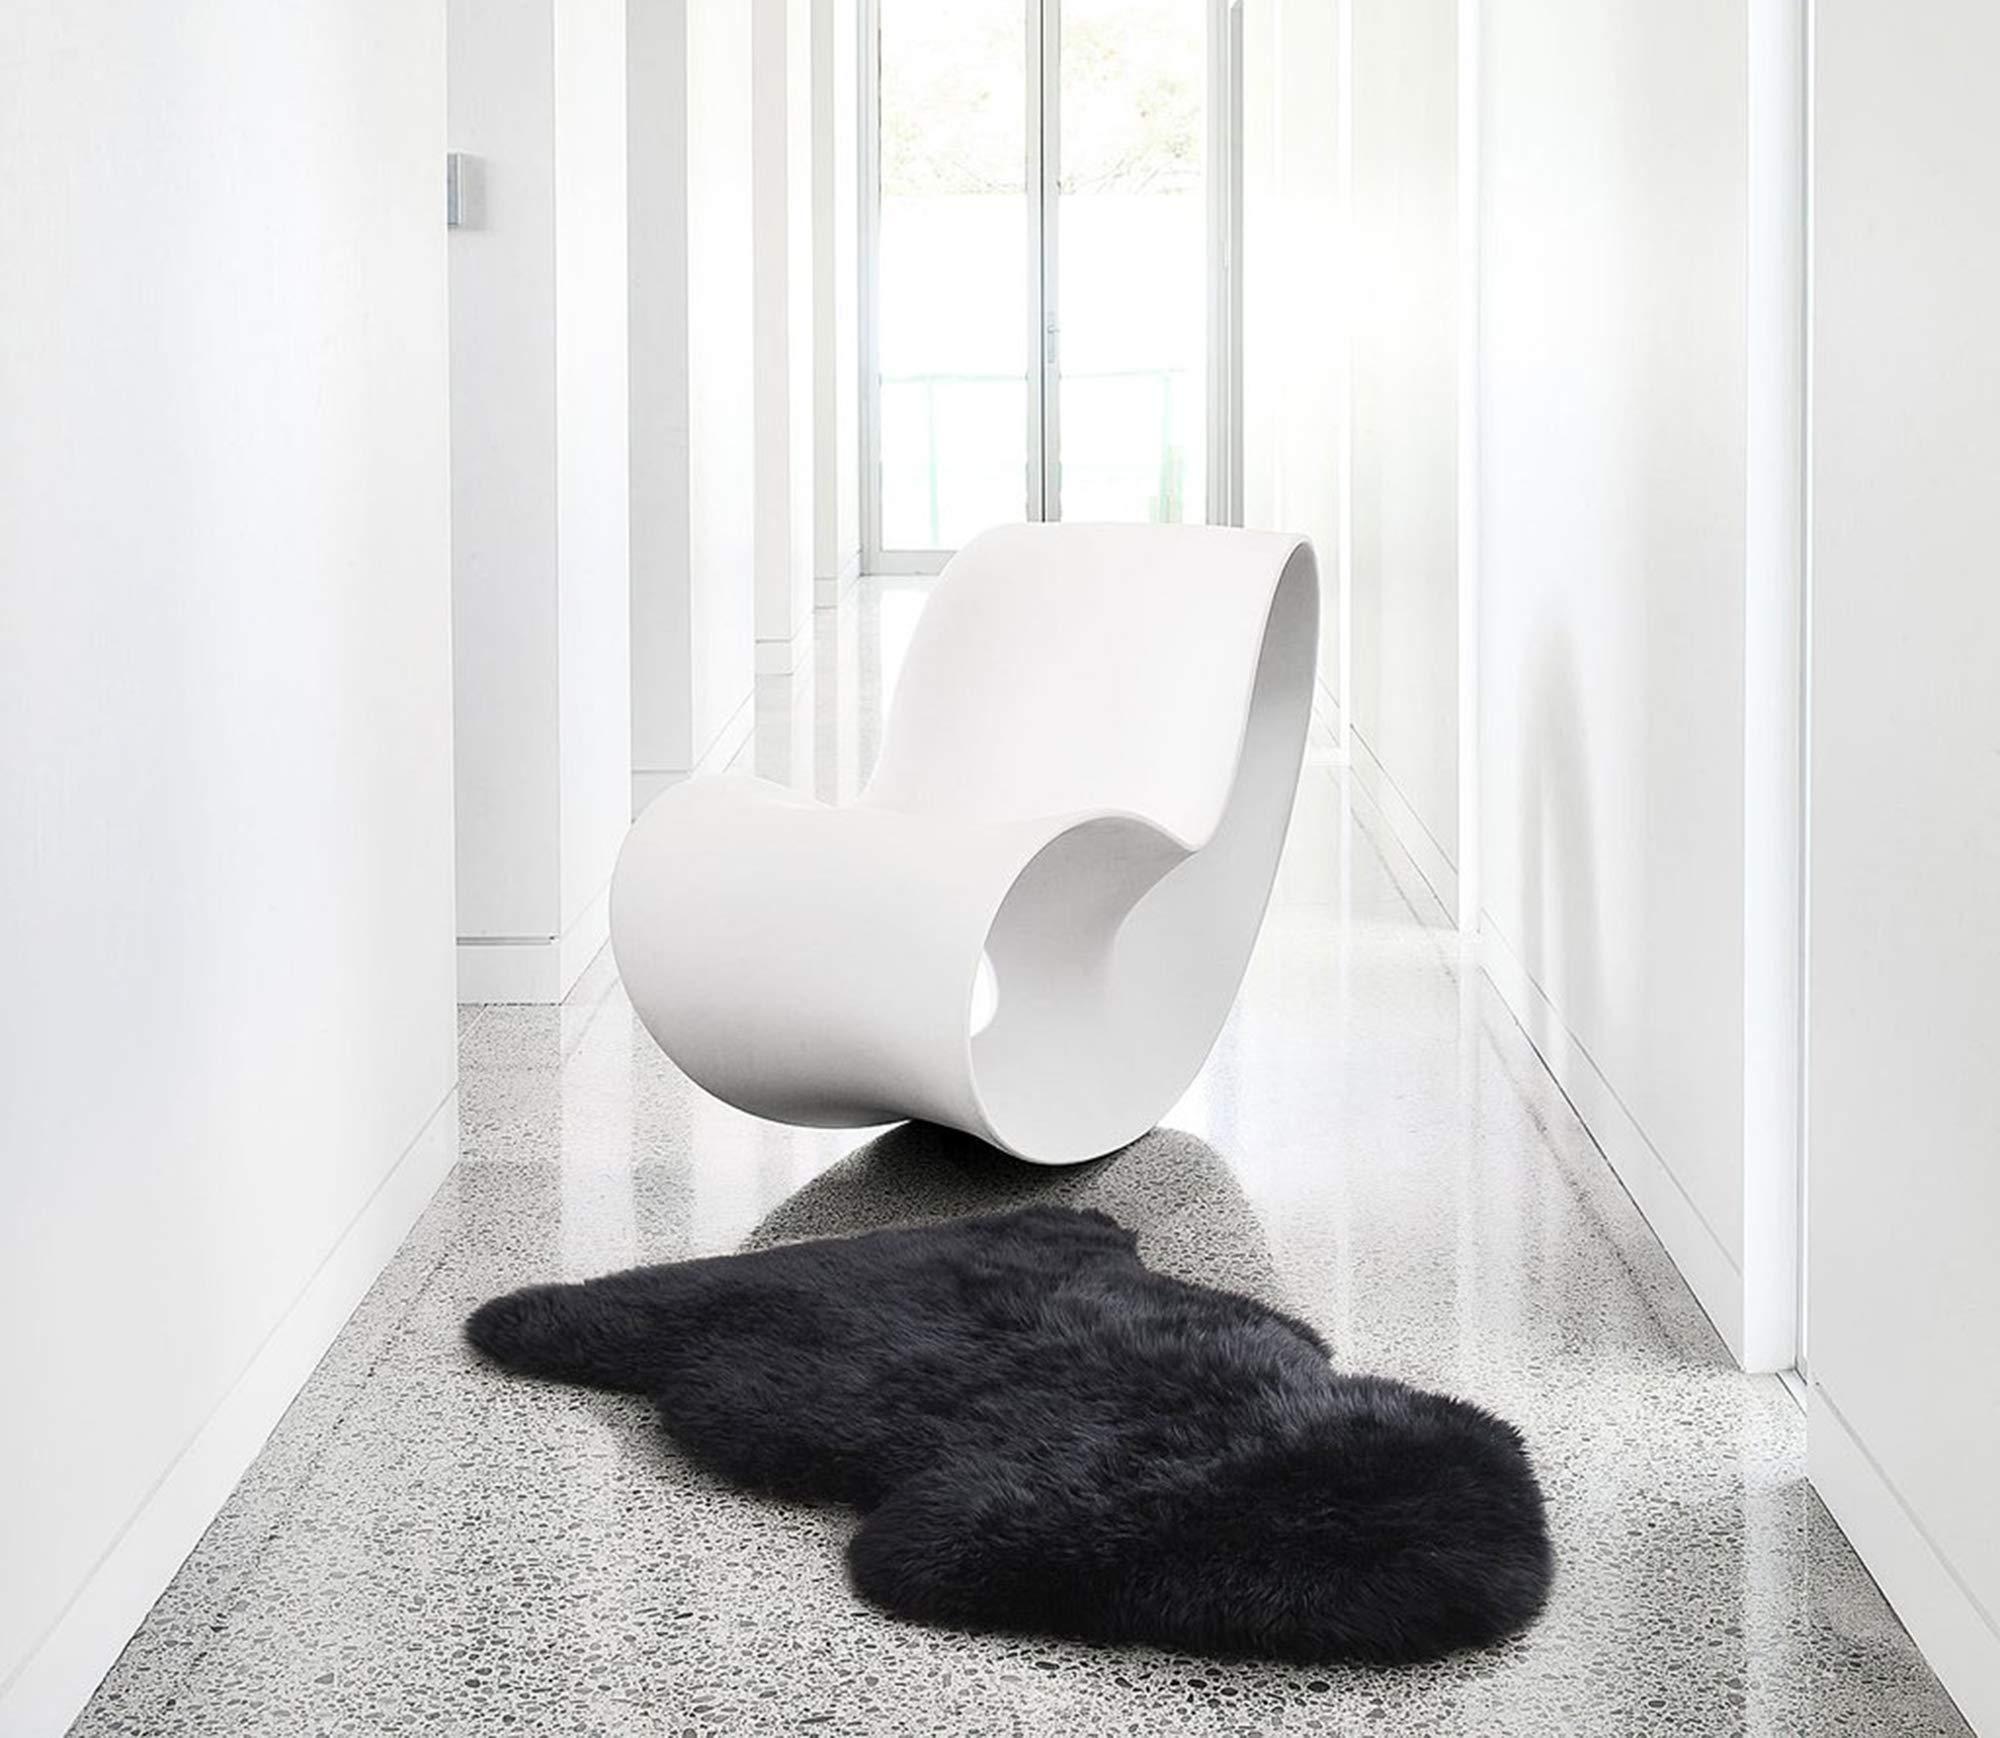 A-STAR(TM) Sheepskin Rug Single Pelt Sheep Fur 2 x 3 - Sheep Skin (Black)